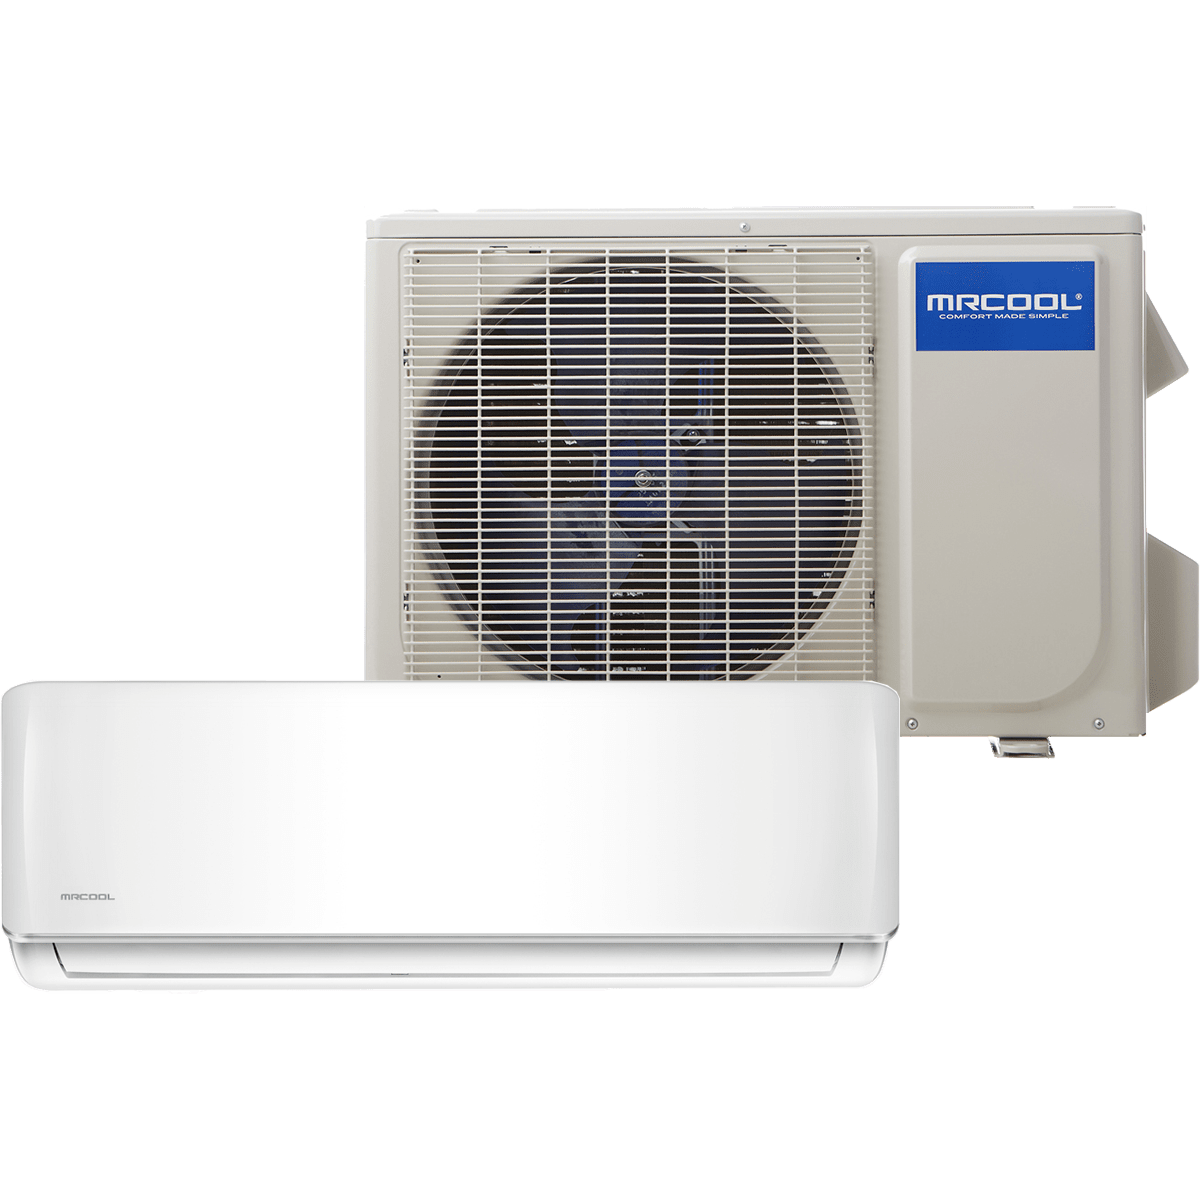 Mrcool Diy 18 000 Btu Mini Split Ac Heat Pump W Smart Controller